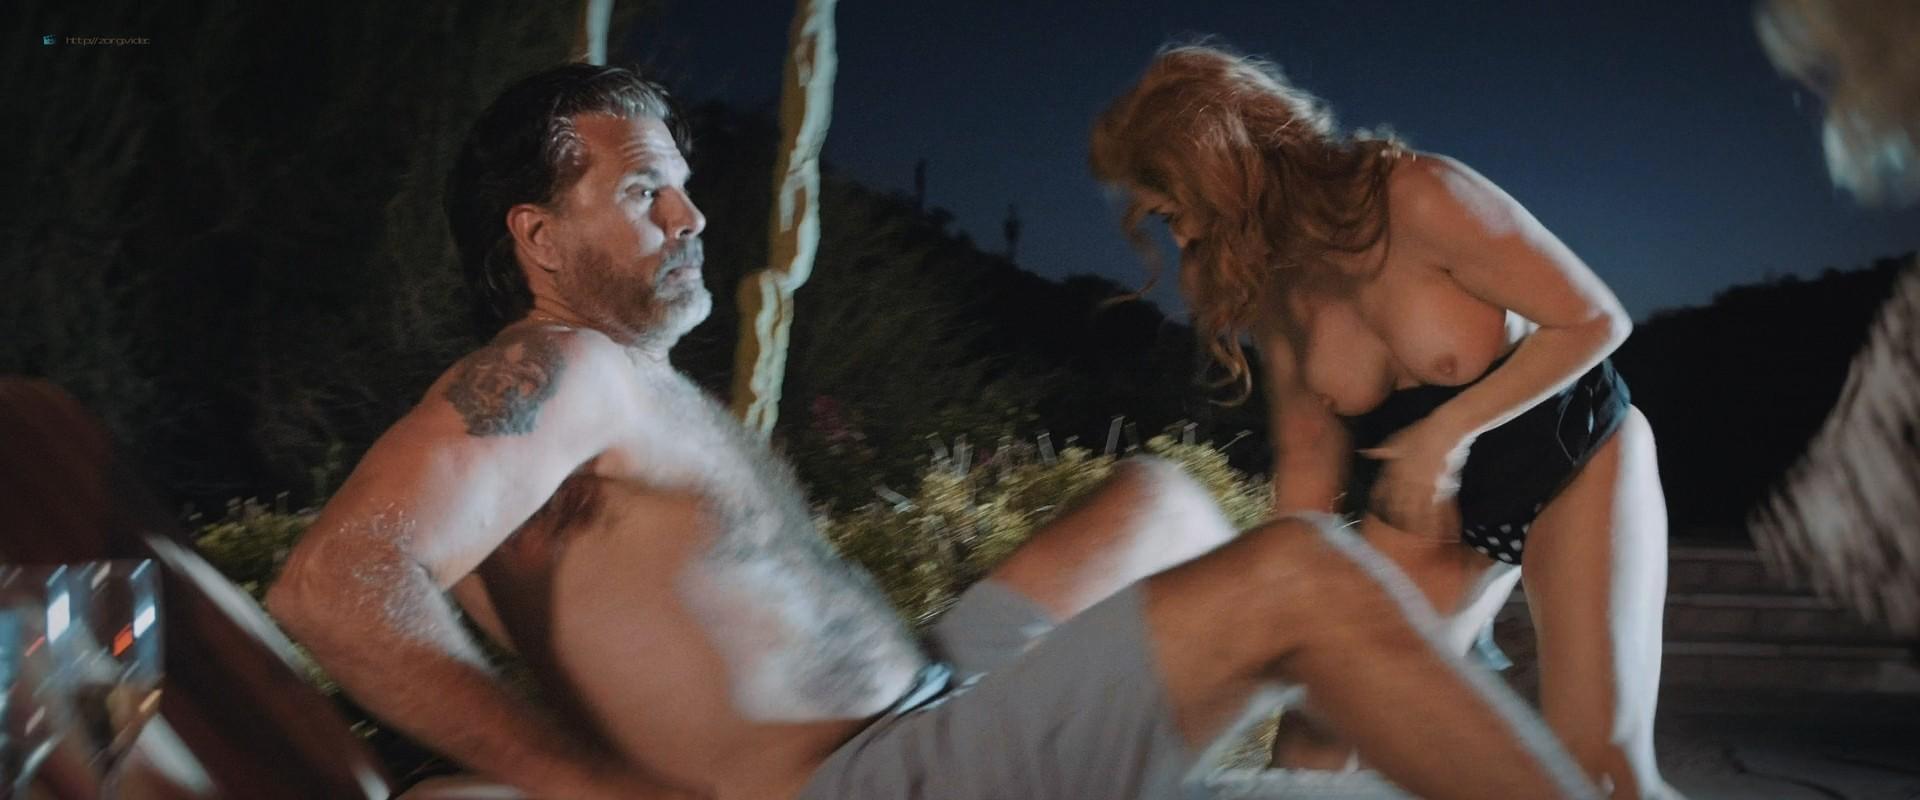 Audrey Beth nude topless Kier Simonetta, Michelle Miller nude too - Water (2019) 1080p (7)